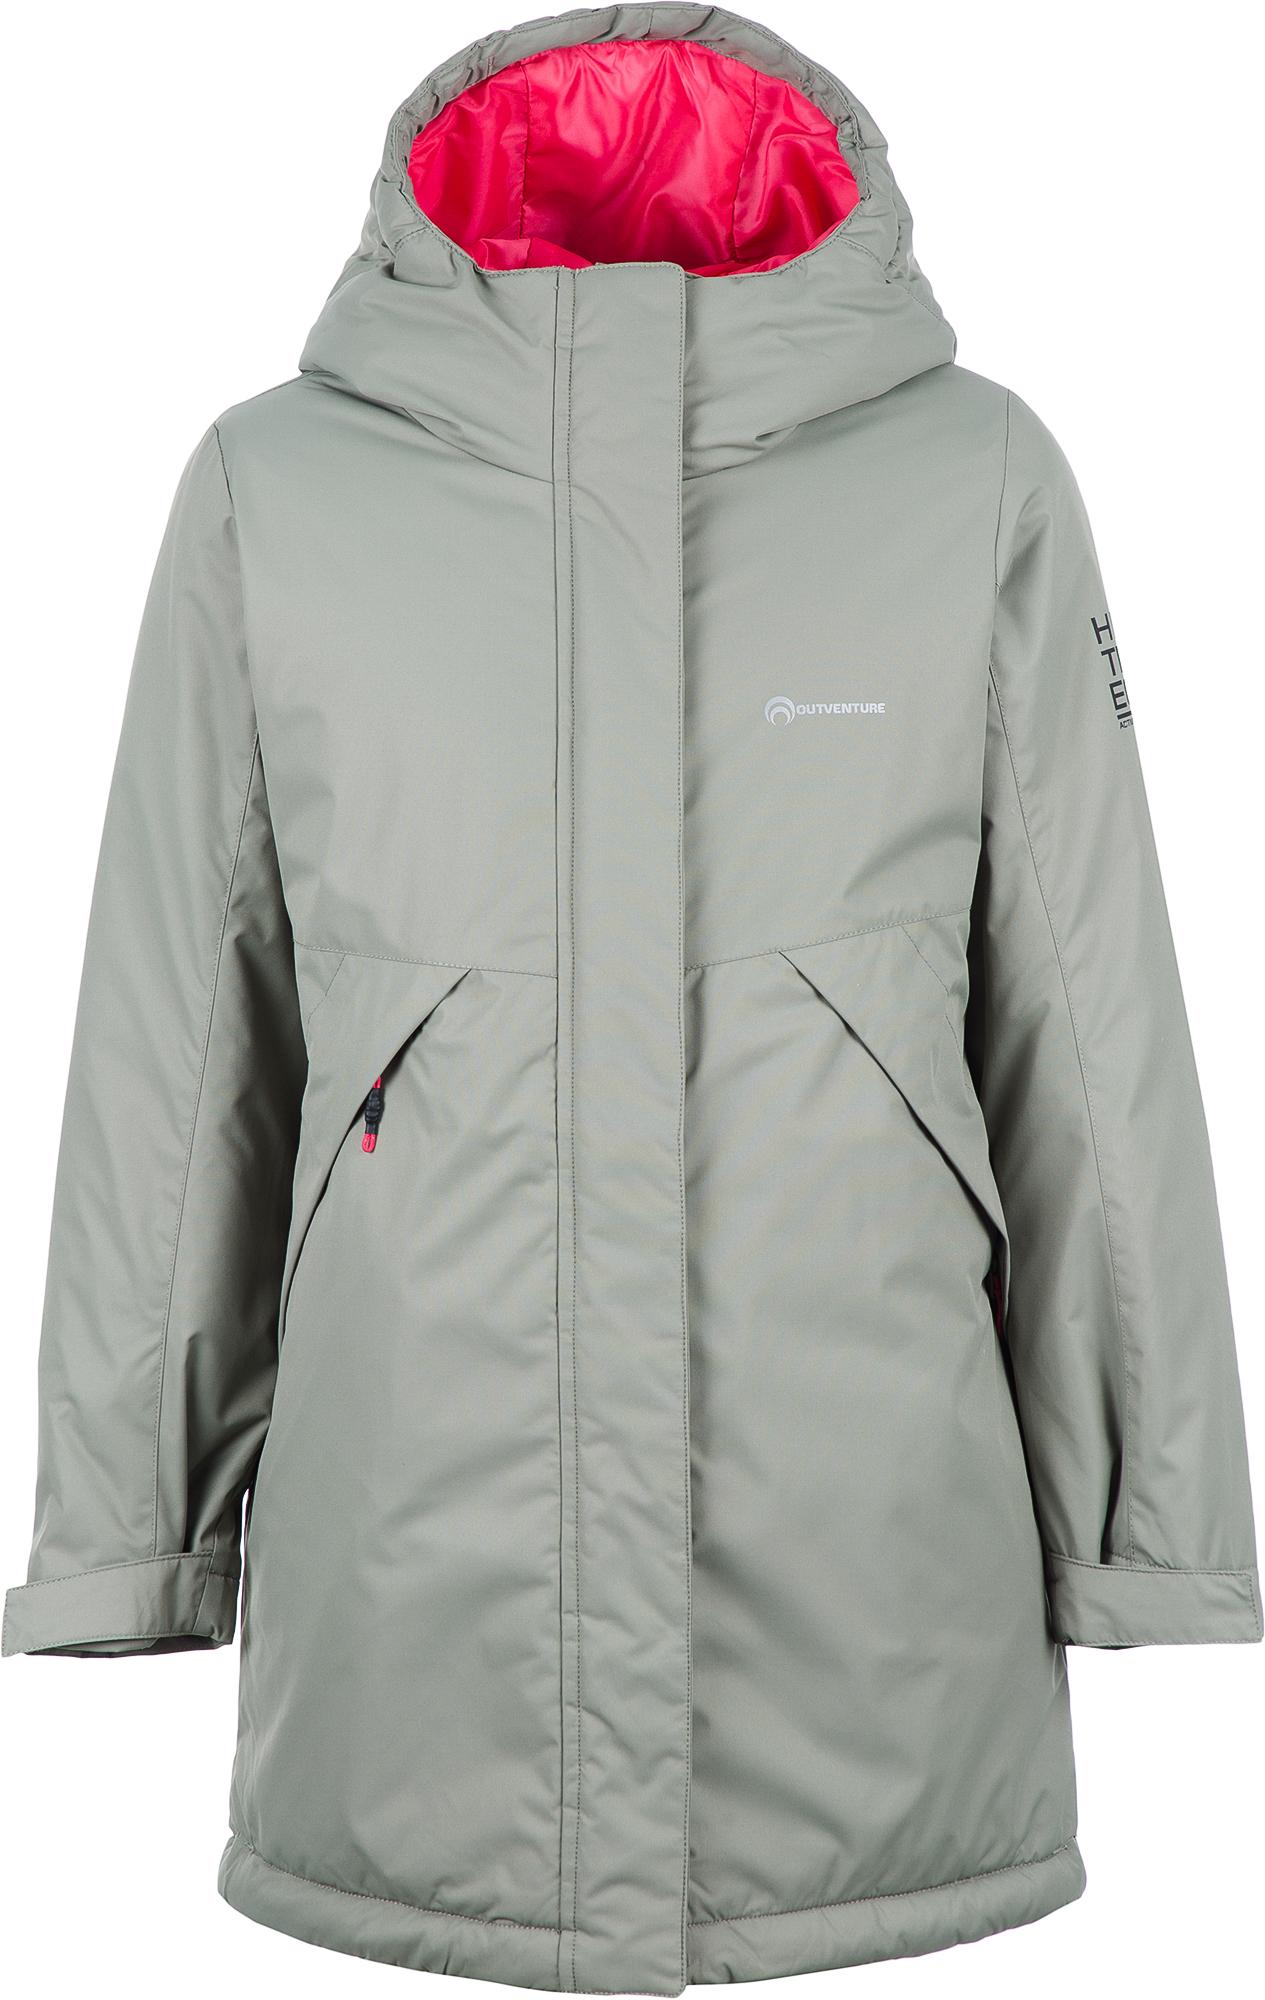 цена на Outventure Куртка утепленная для девочек Outventure, размер 140